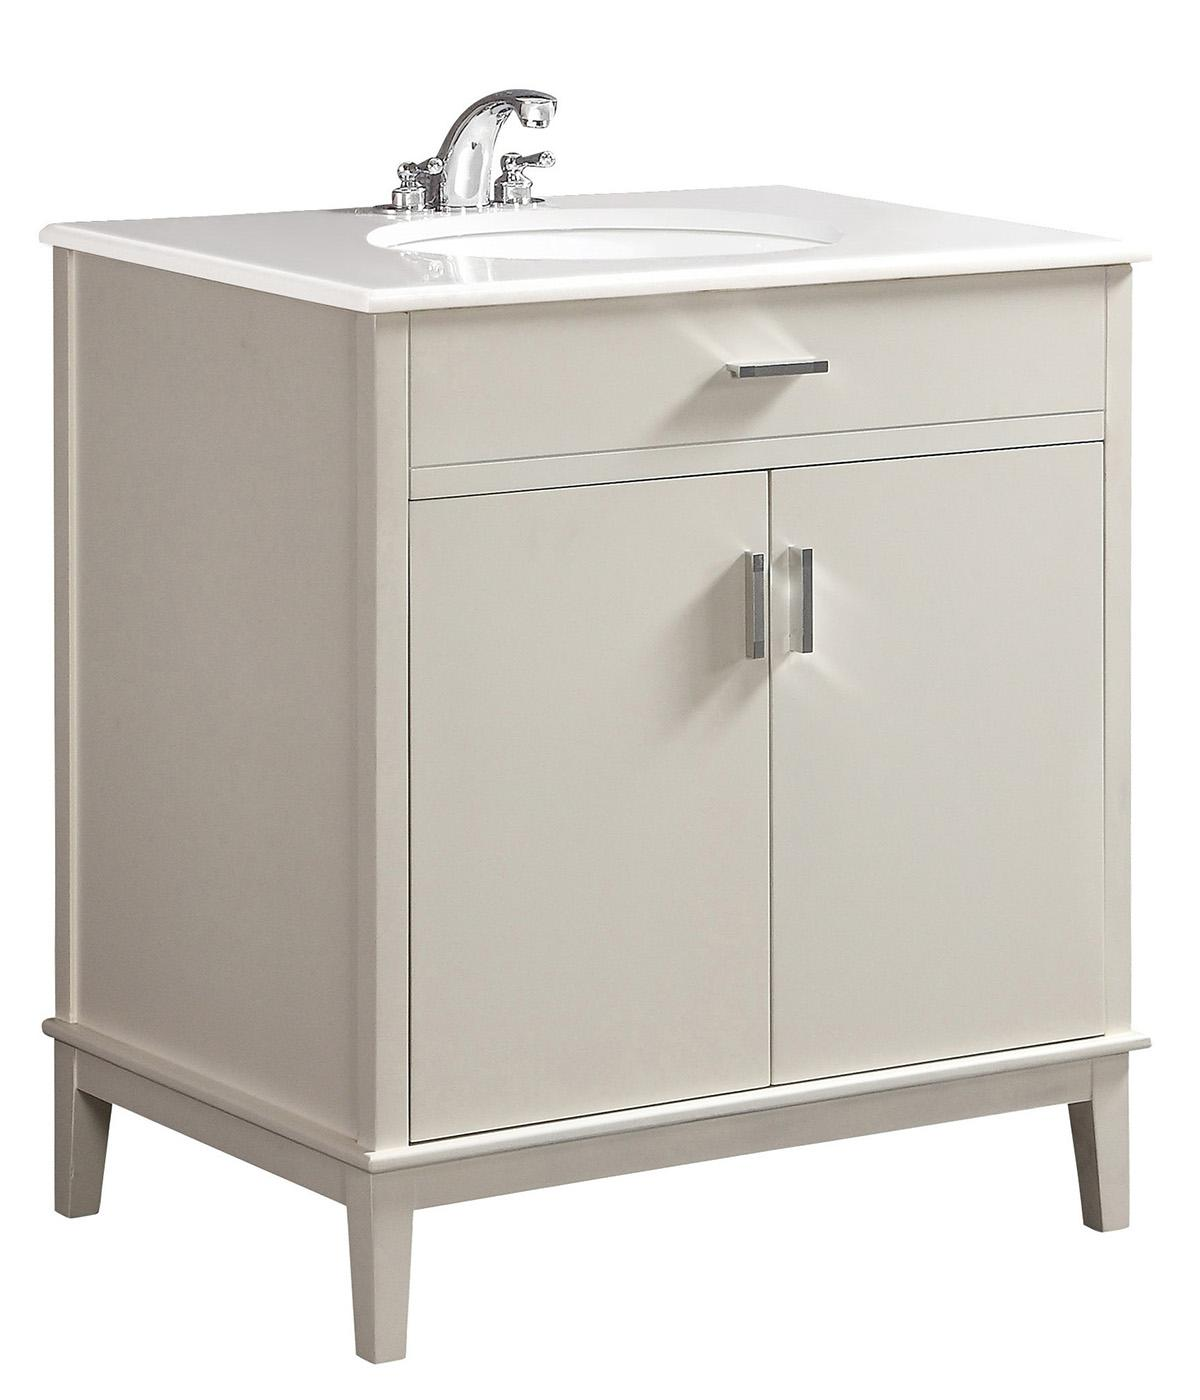 Simpli home urban loft 30 bath vanity with quartz marble for Bathroom cabinets urban ladder